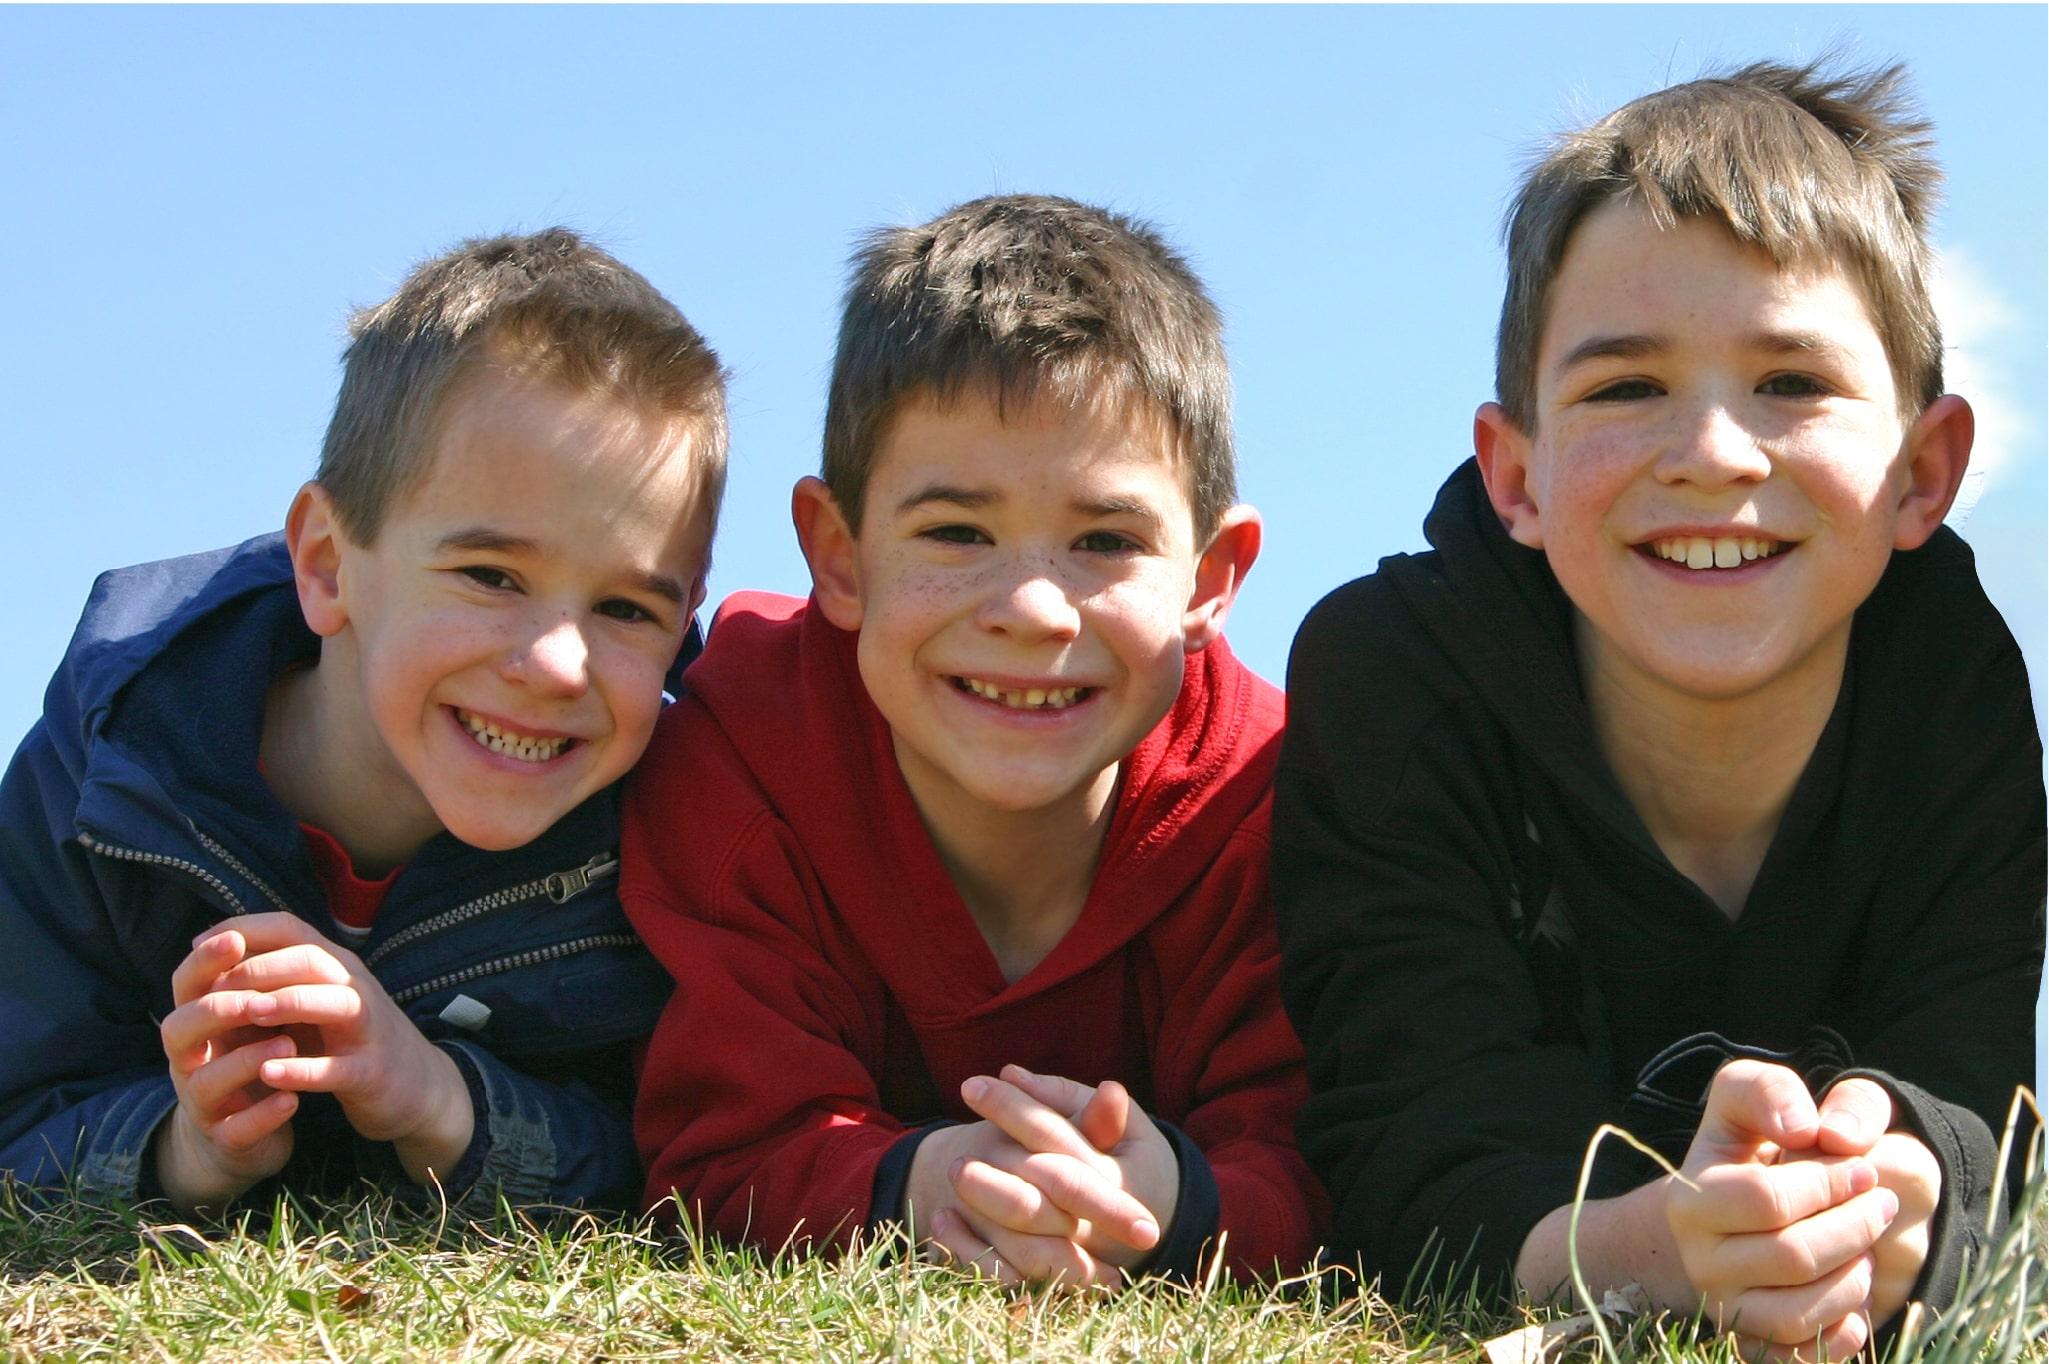 Three boys smiling lying on the grass